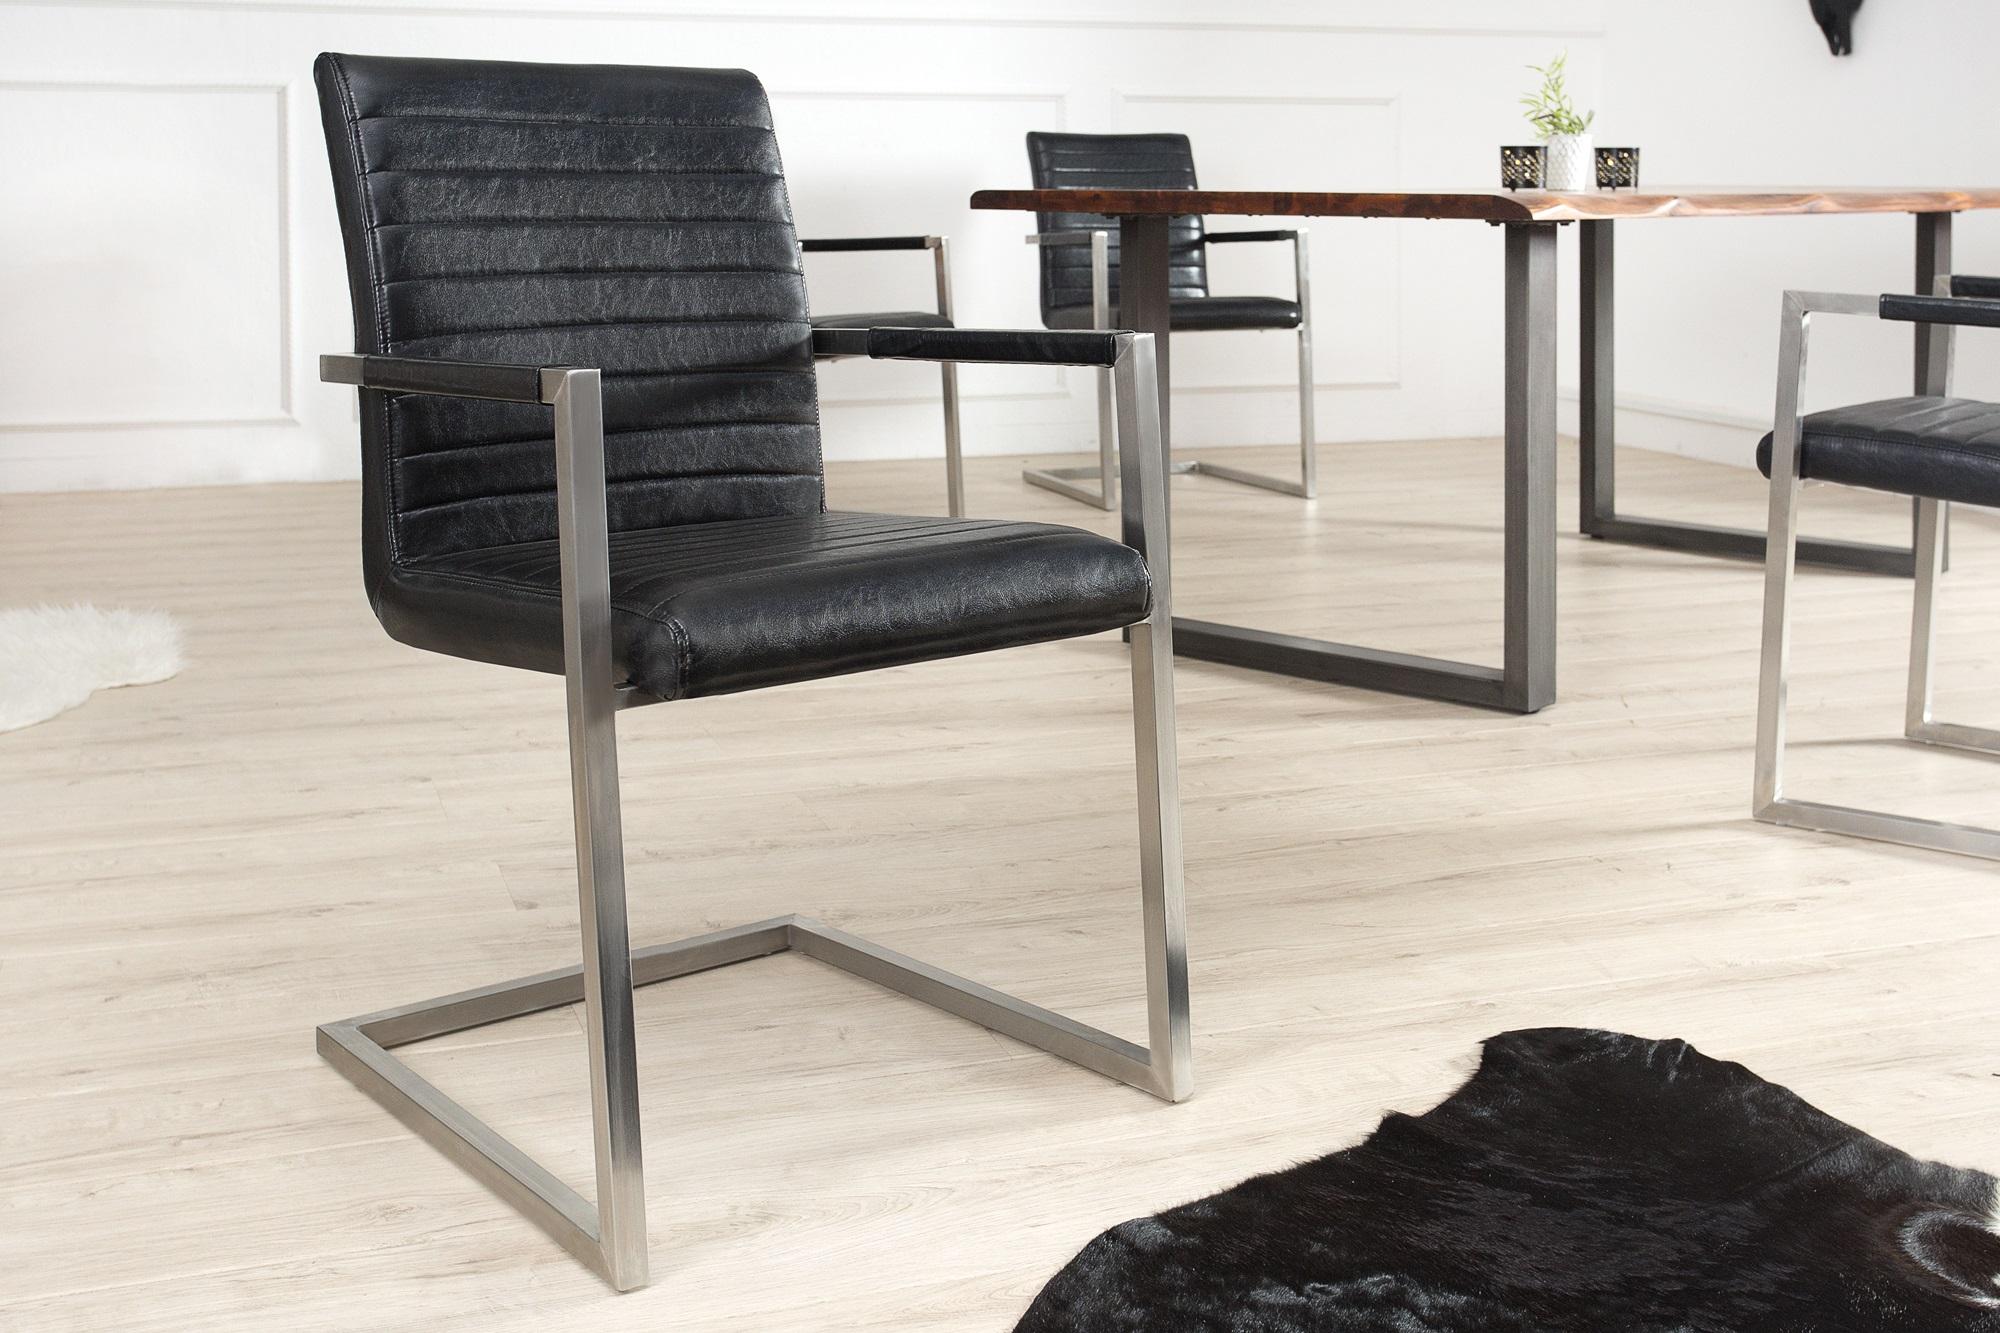 Stoel Metalen Frame : Moderne stoel rvs kopen meubeldeals